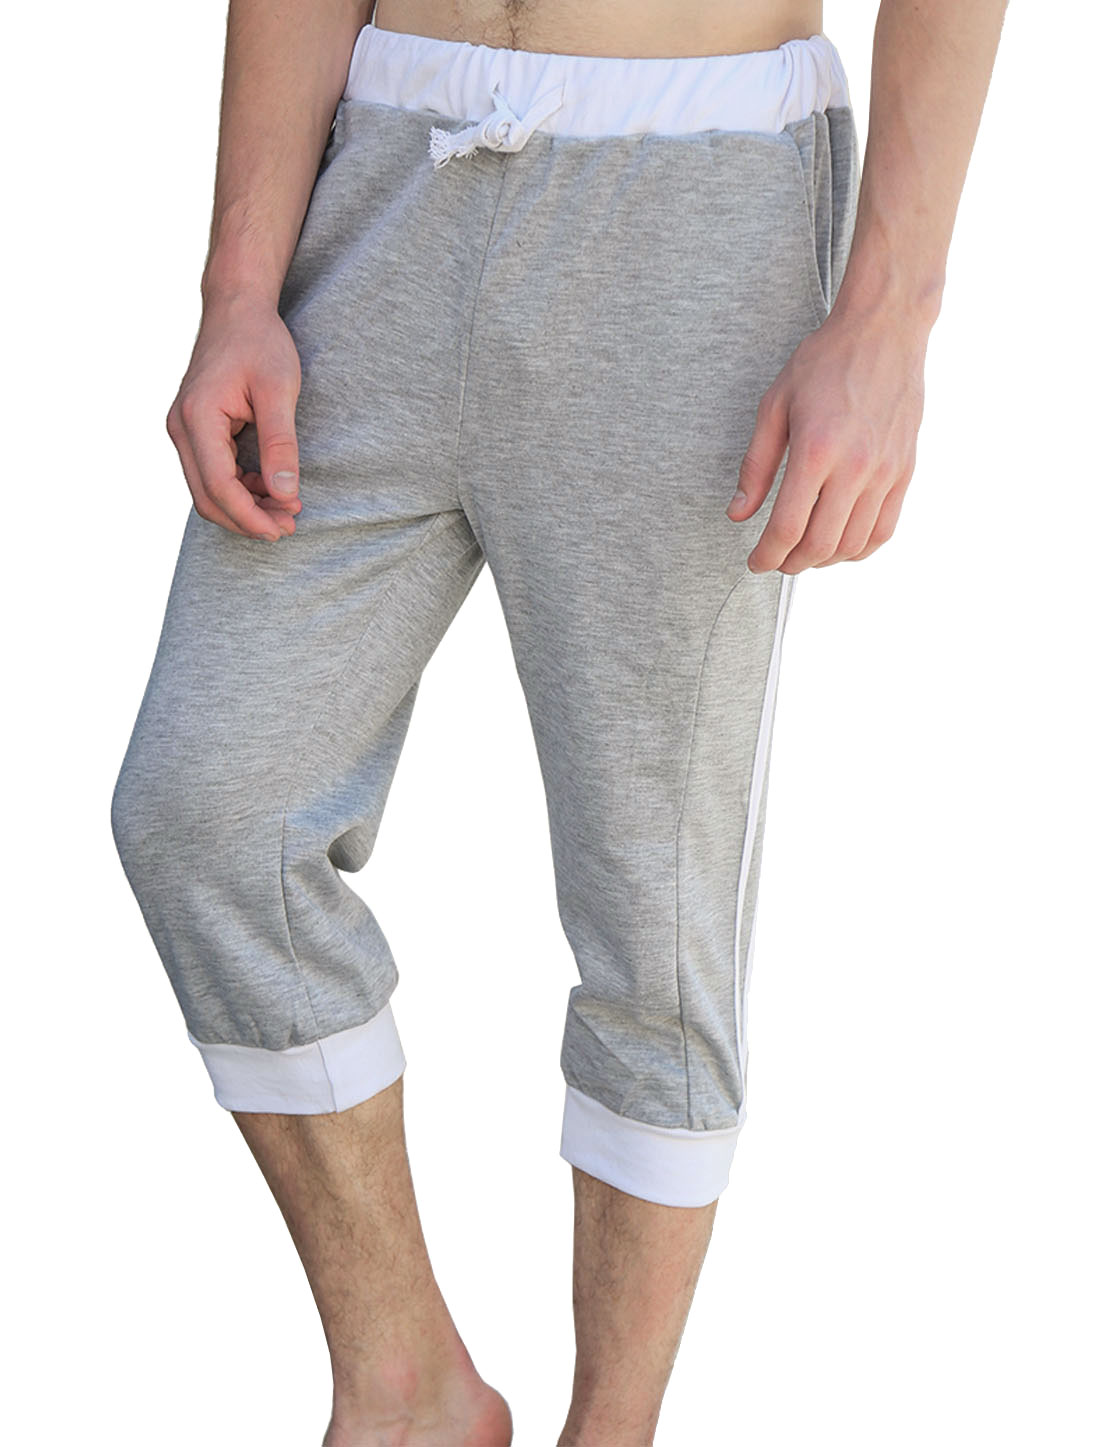 Men Elastic Waist Pockets Leisure Sport Pants Light Gray White W30